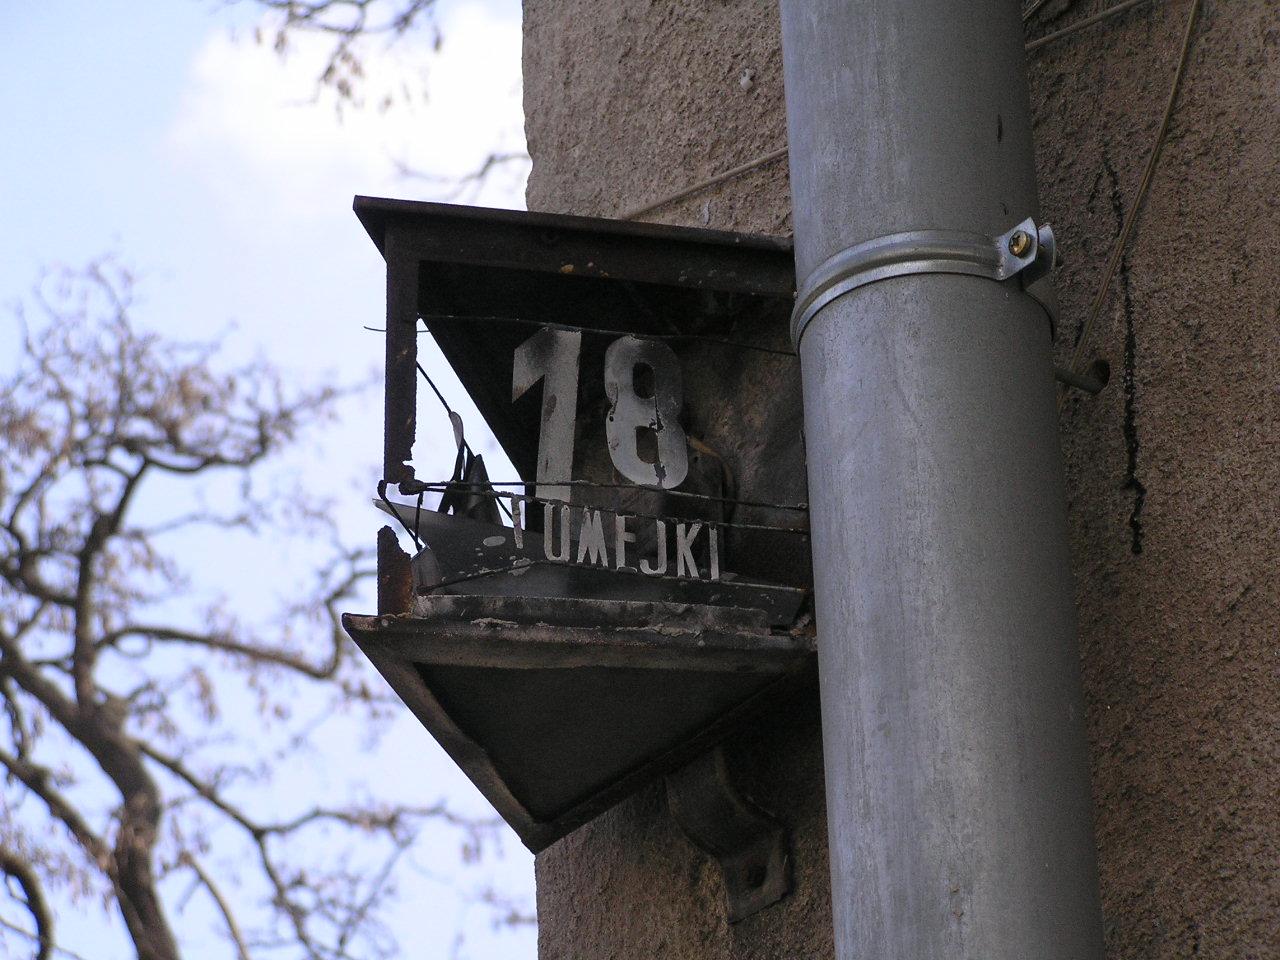 Latarenka adresowa - Domeyki 18